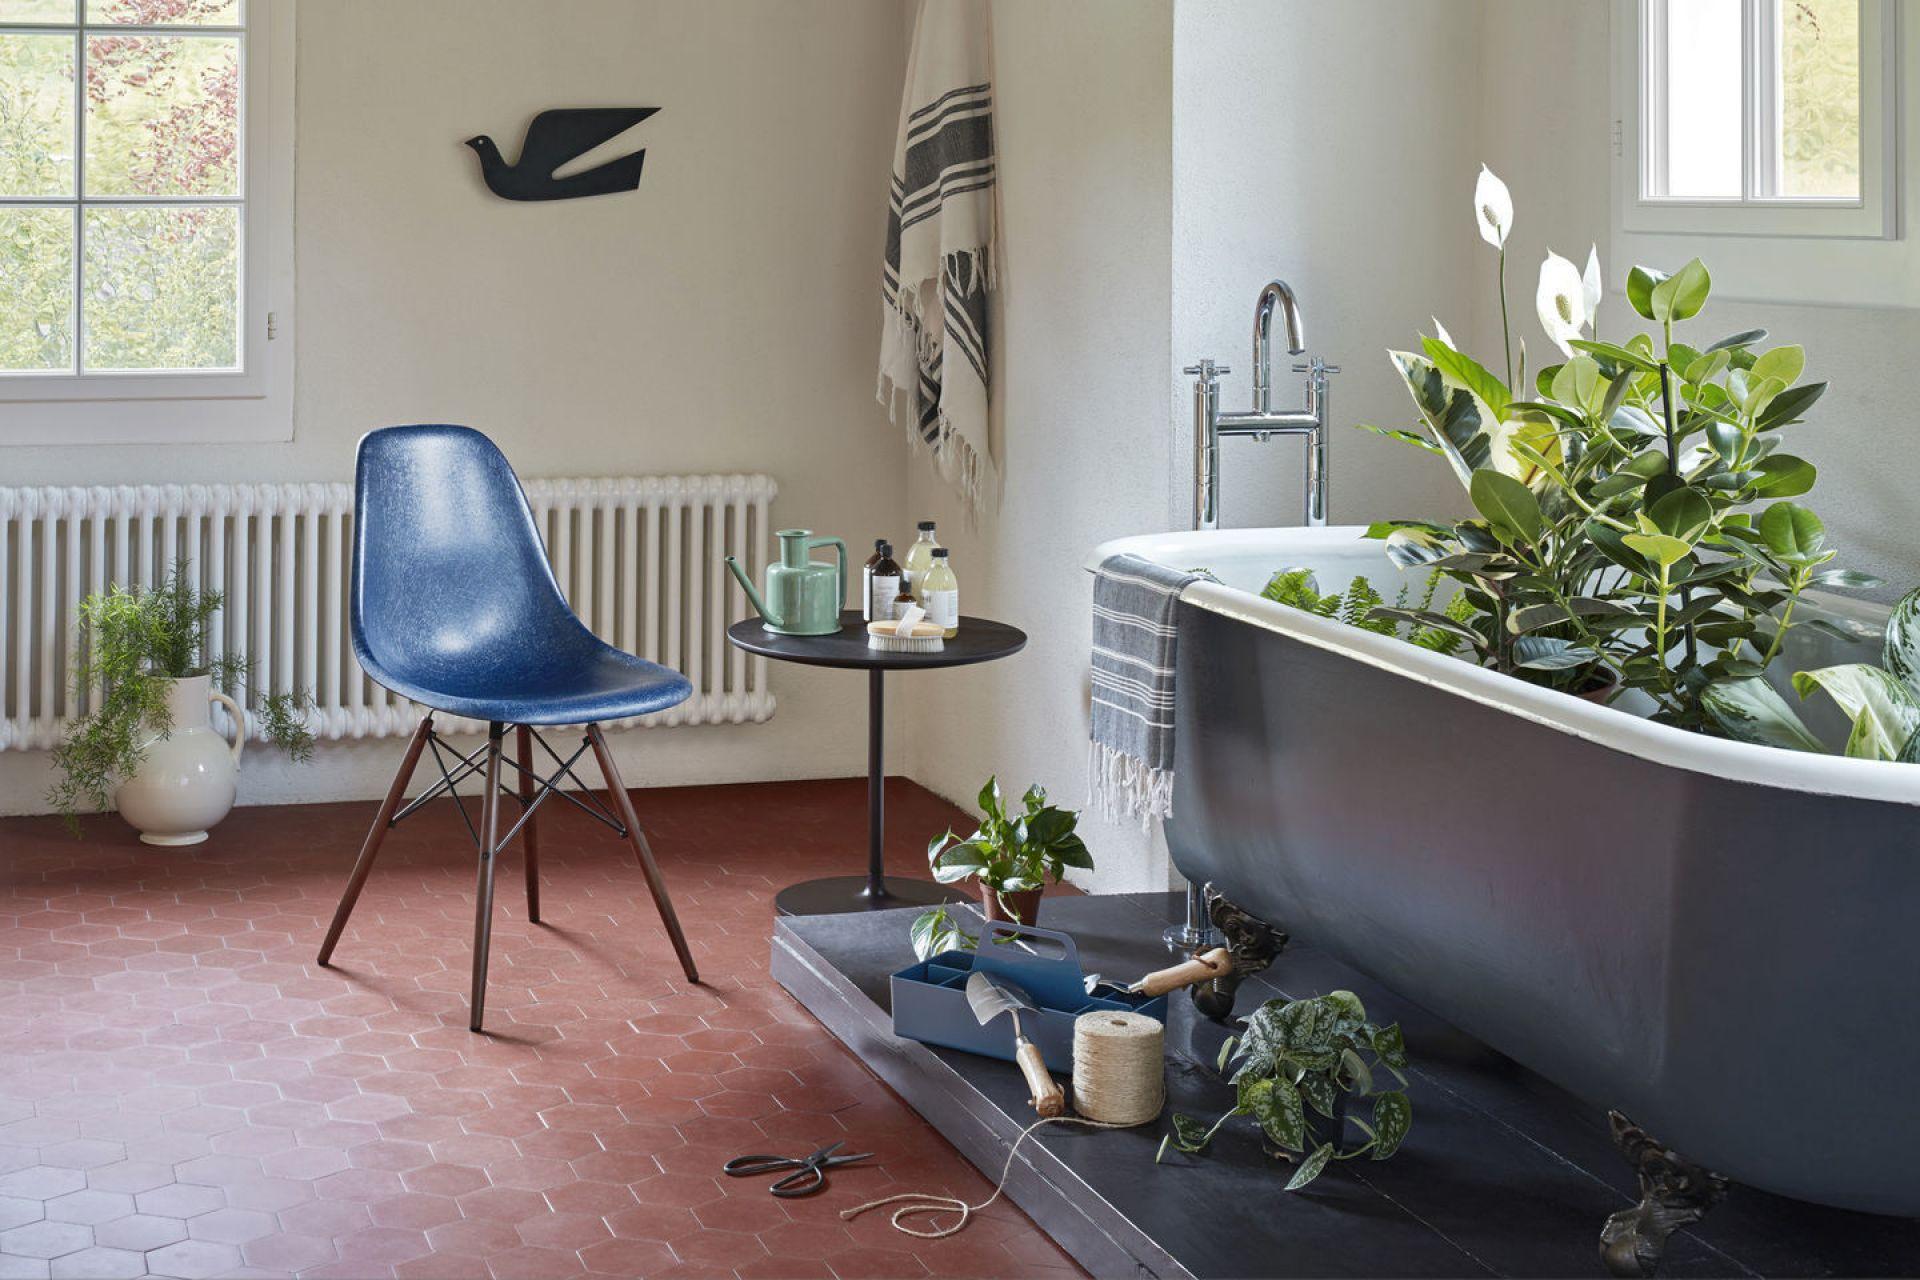 Eames Plastic Side Chair DSR Stuhl Vitra Schwarz-Granit grau